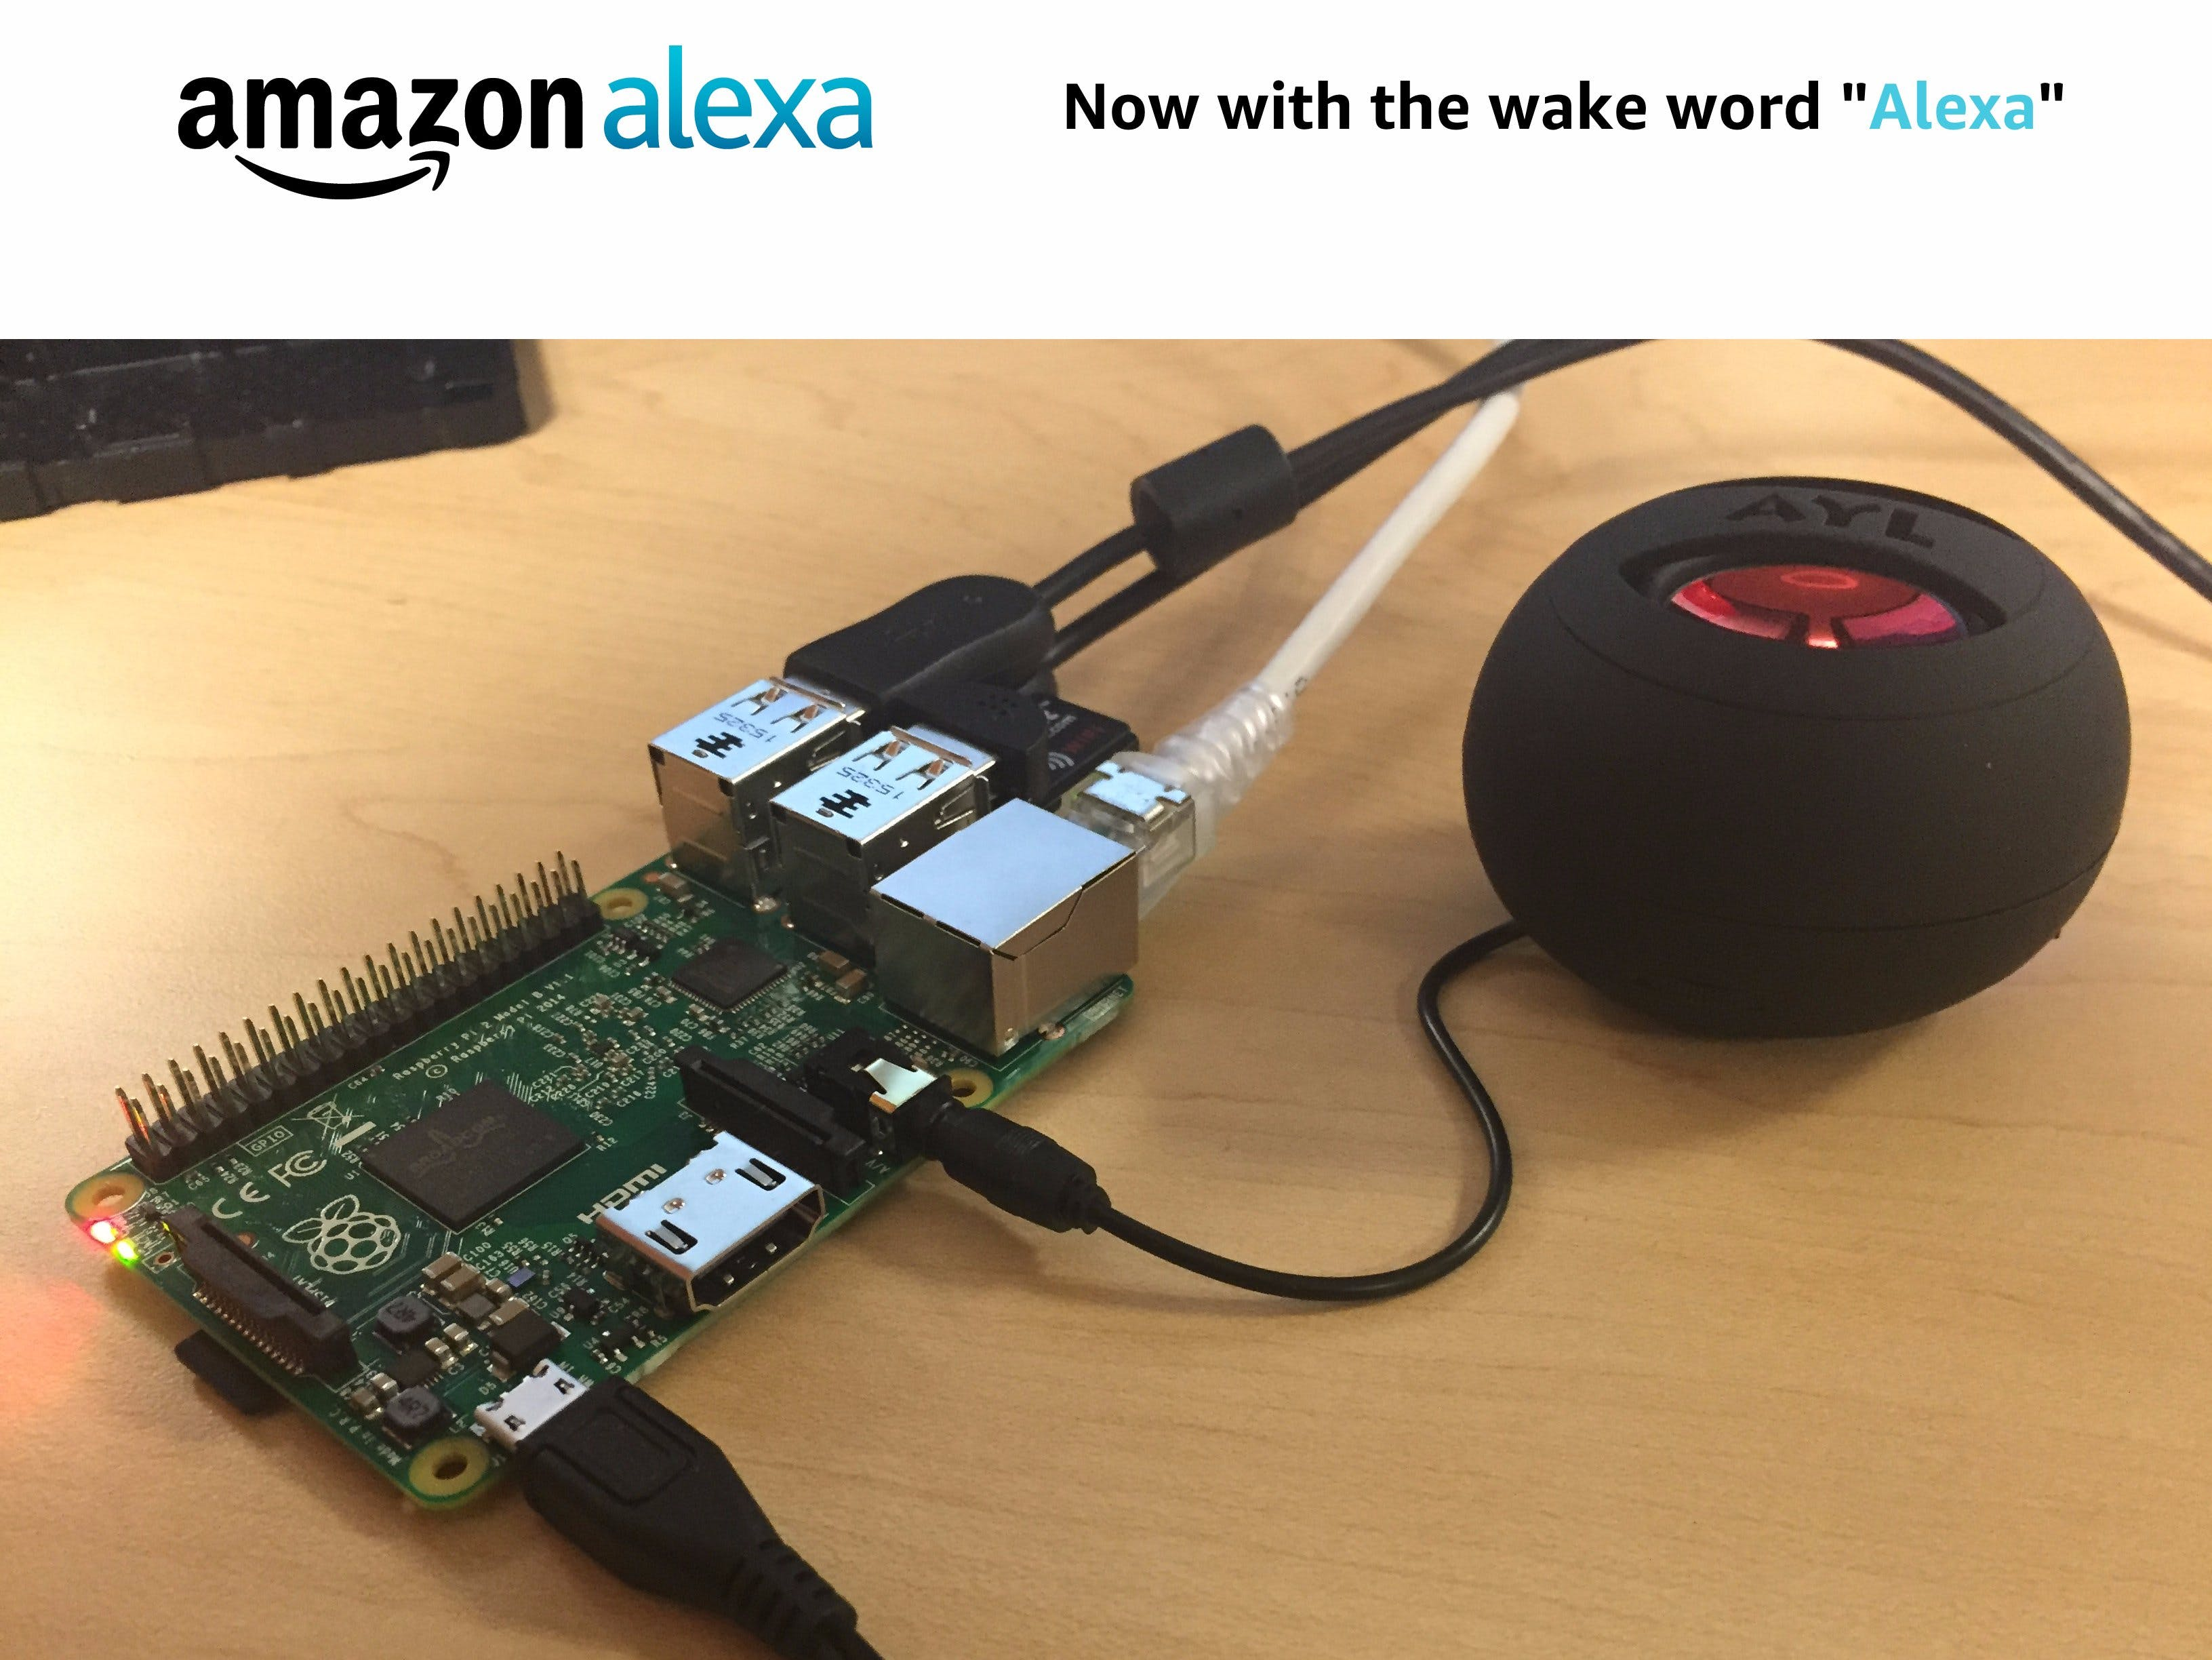 Hands-Free Alexa on Raspberry Pi